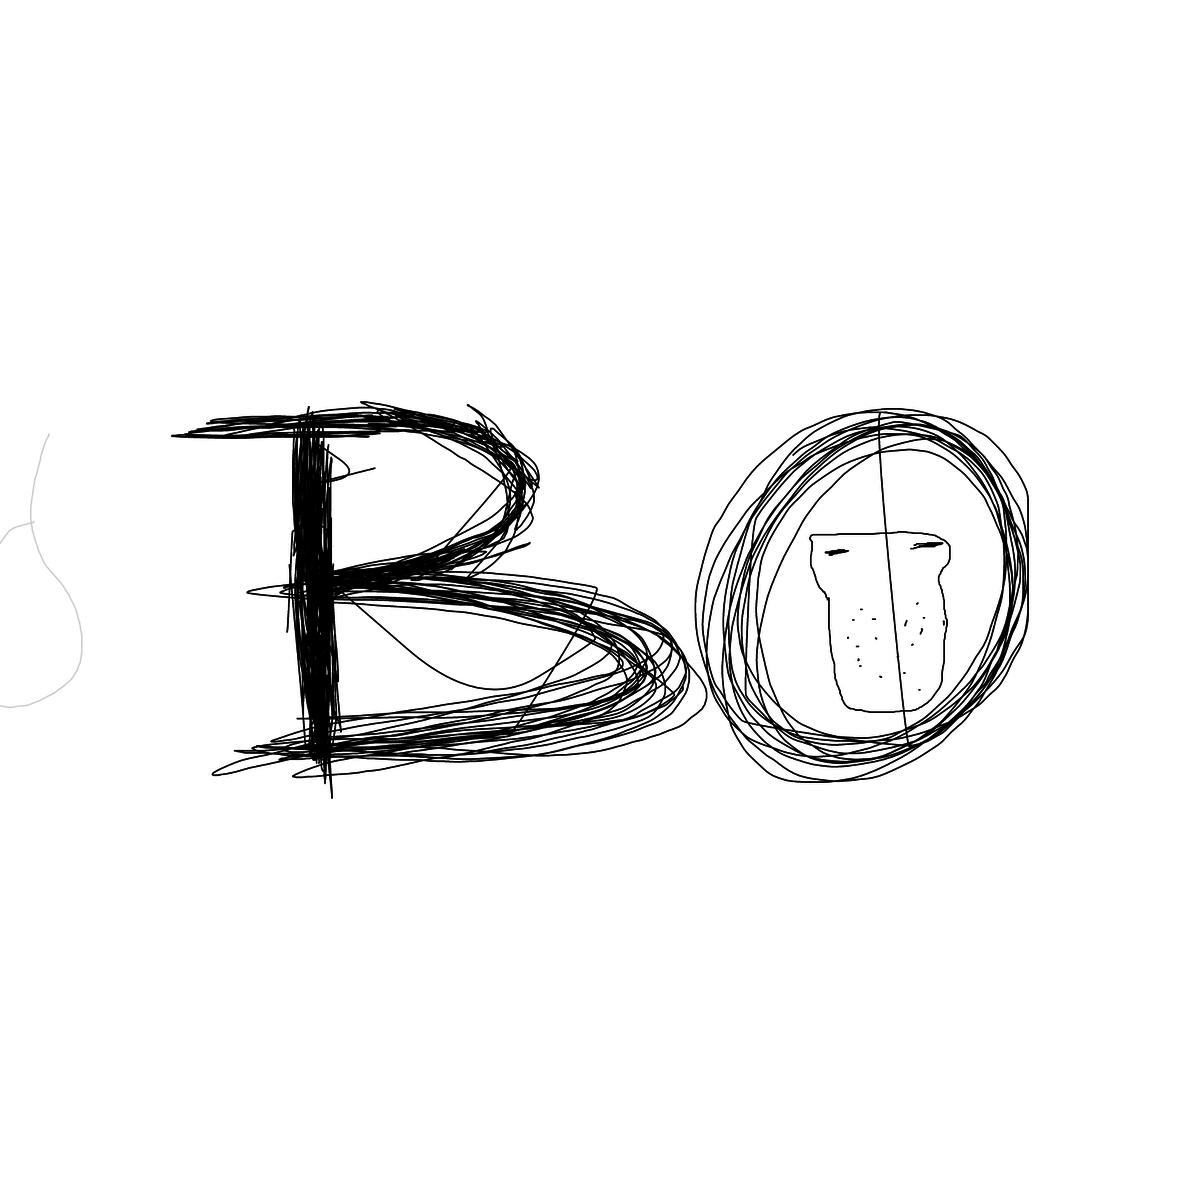 BAAAM drawing#17185 lat:51.2066764831543000lng: 3.2590010166168213